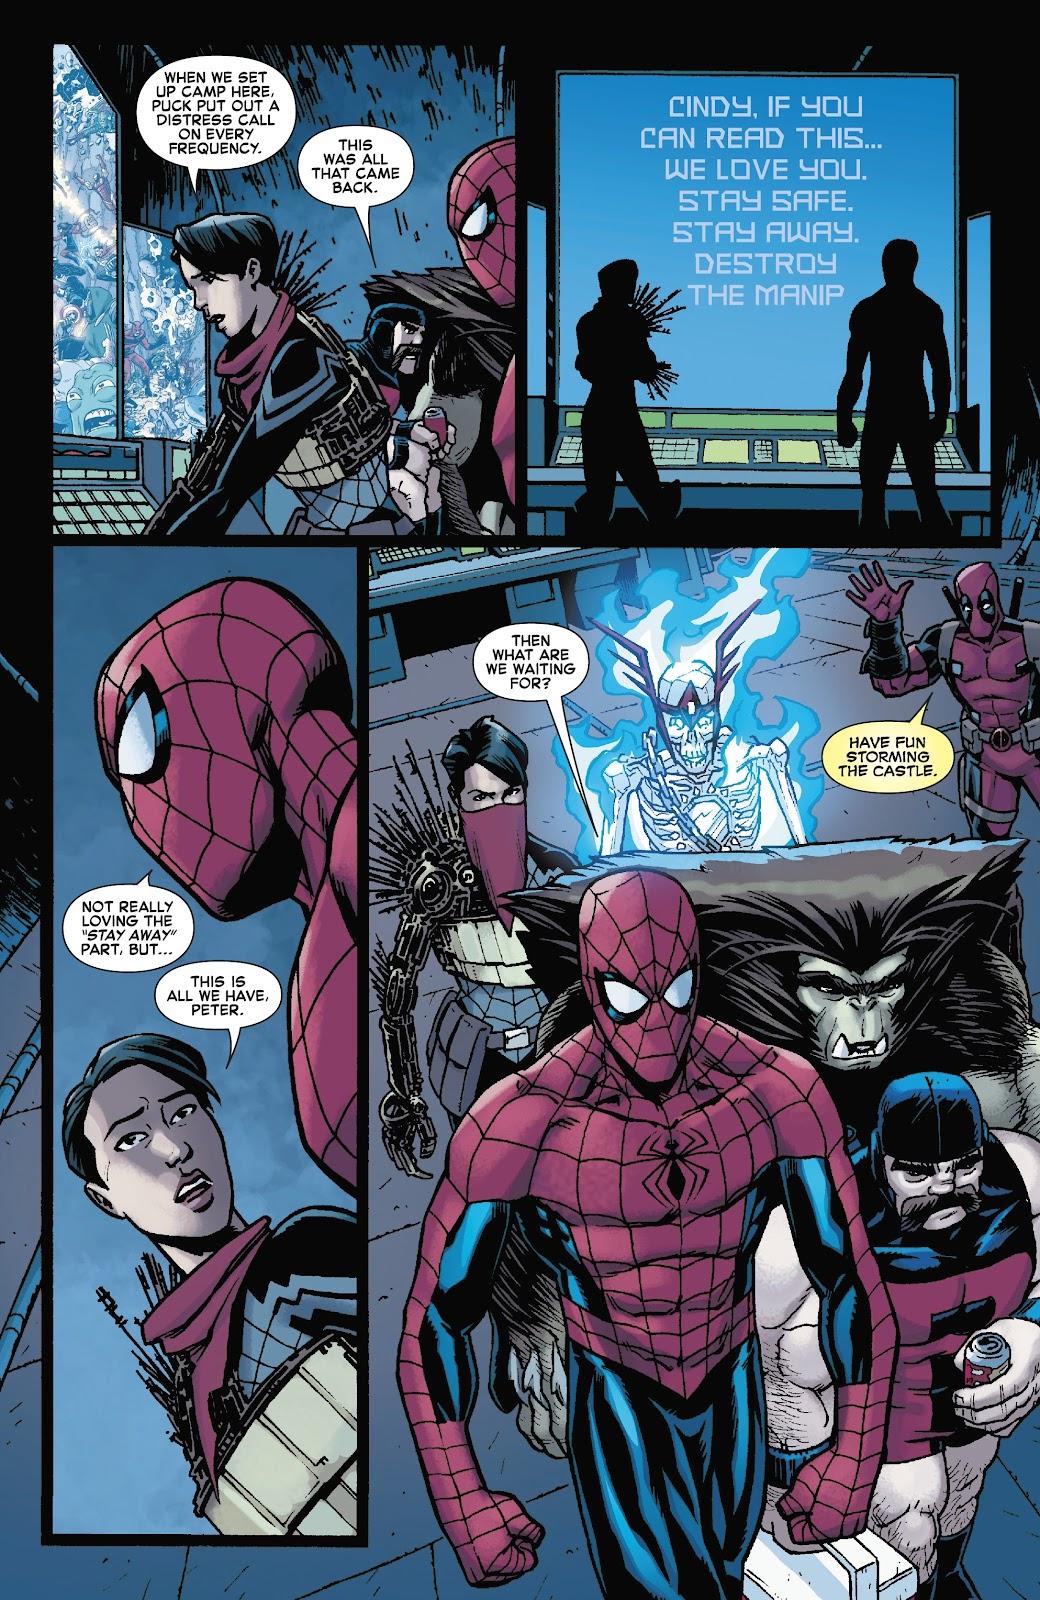 Read online Spider-Man/Deadpool comic -  Issue #47 - 7